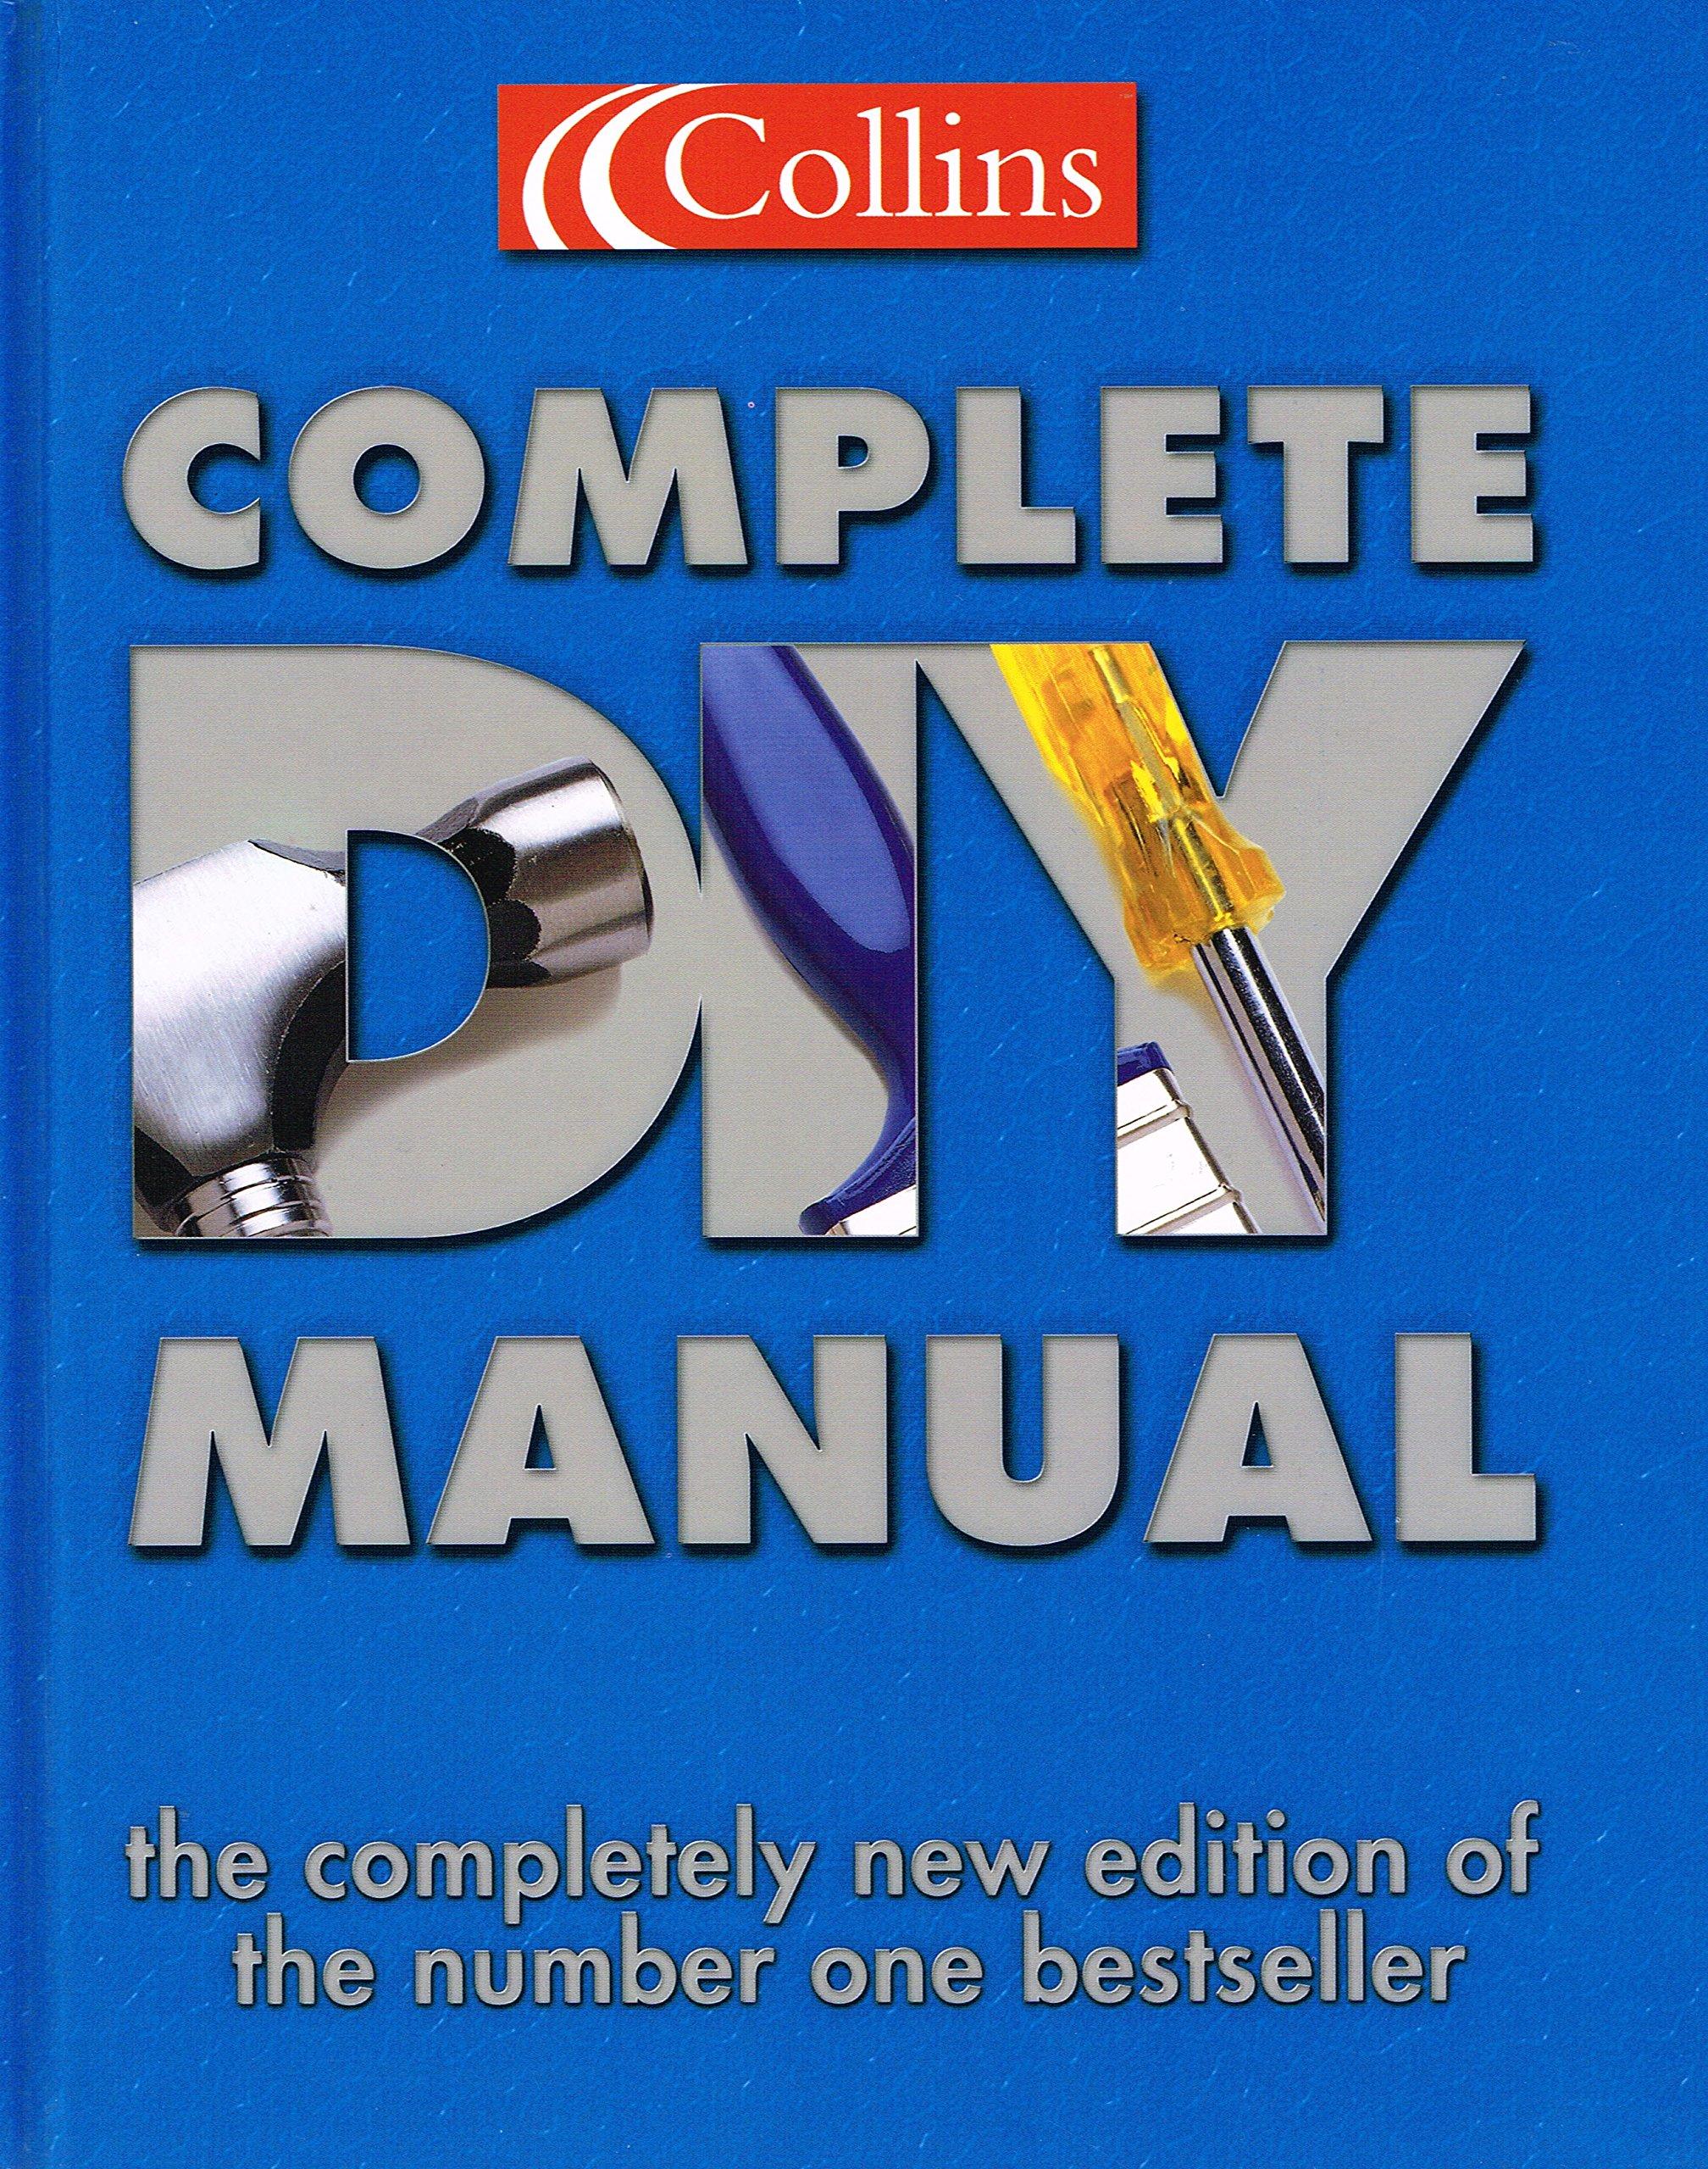 collins complete diy manual amazon co uk albert jackson david day rh amazon co uk collins diy manual pdf collins diy manual aldi